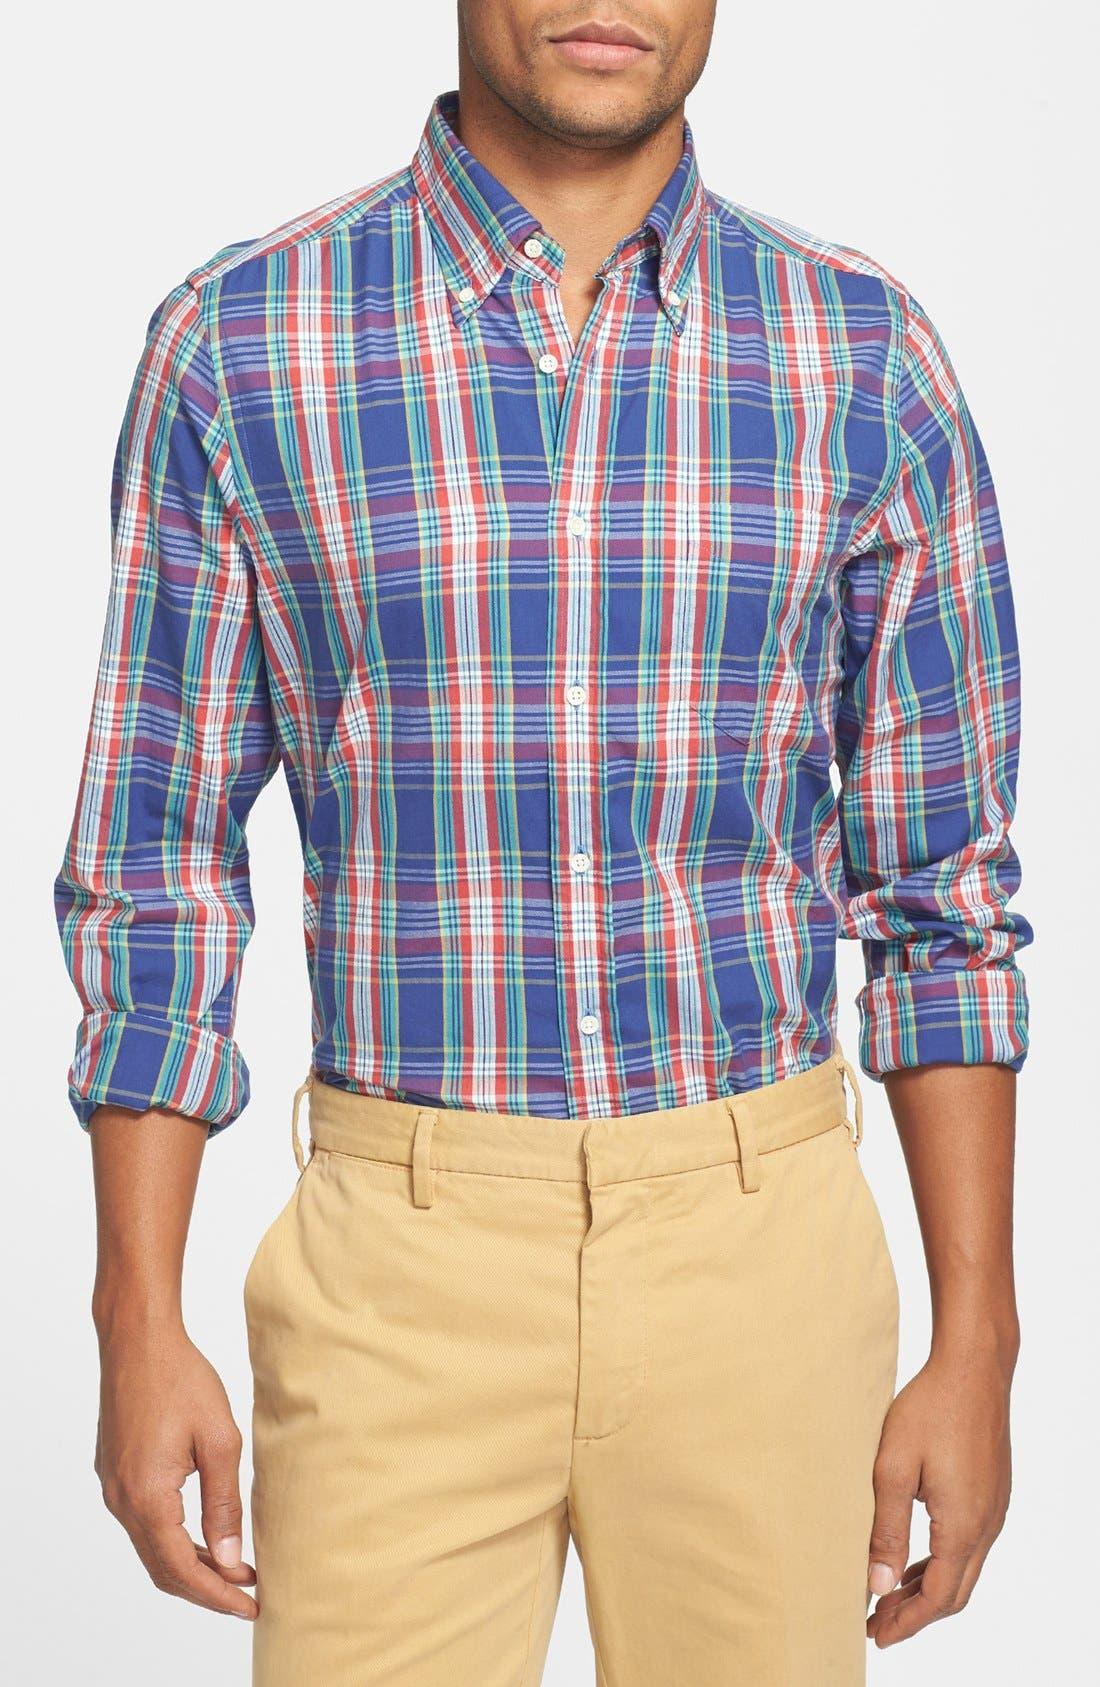 Main Image - Gant Rugger 'Dreamy' Plaid Oxford Shirt